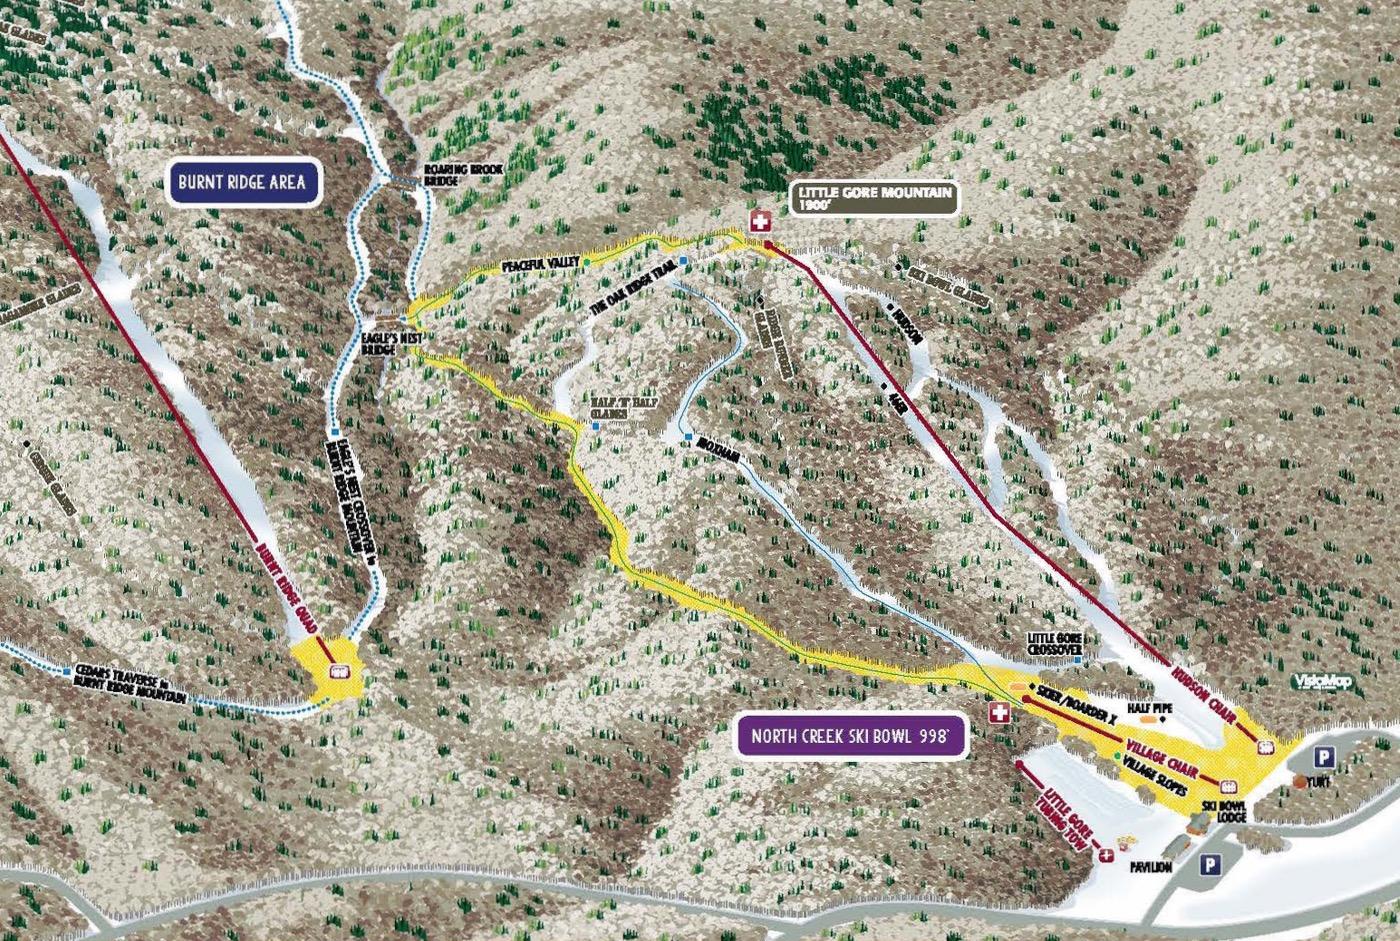 north-creek-ski-bowl-trail-map